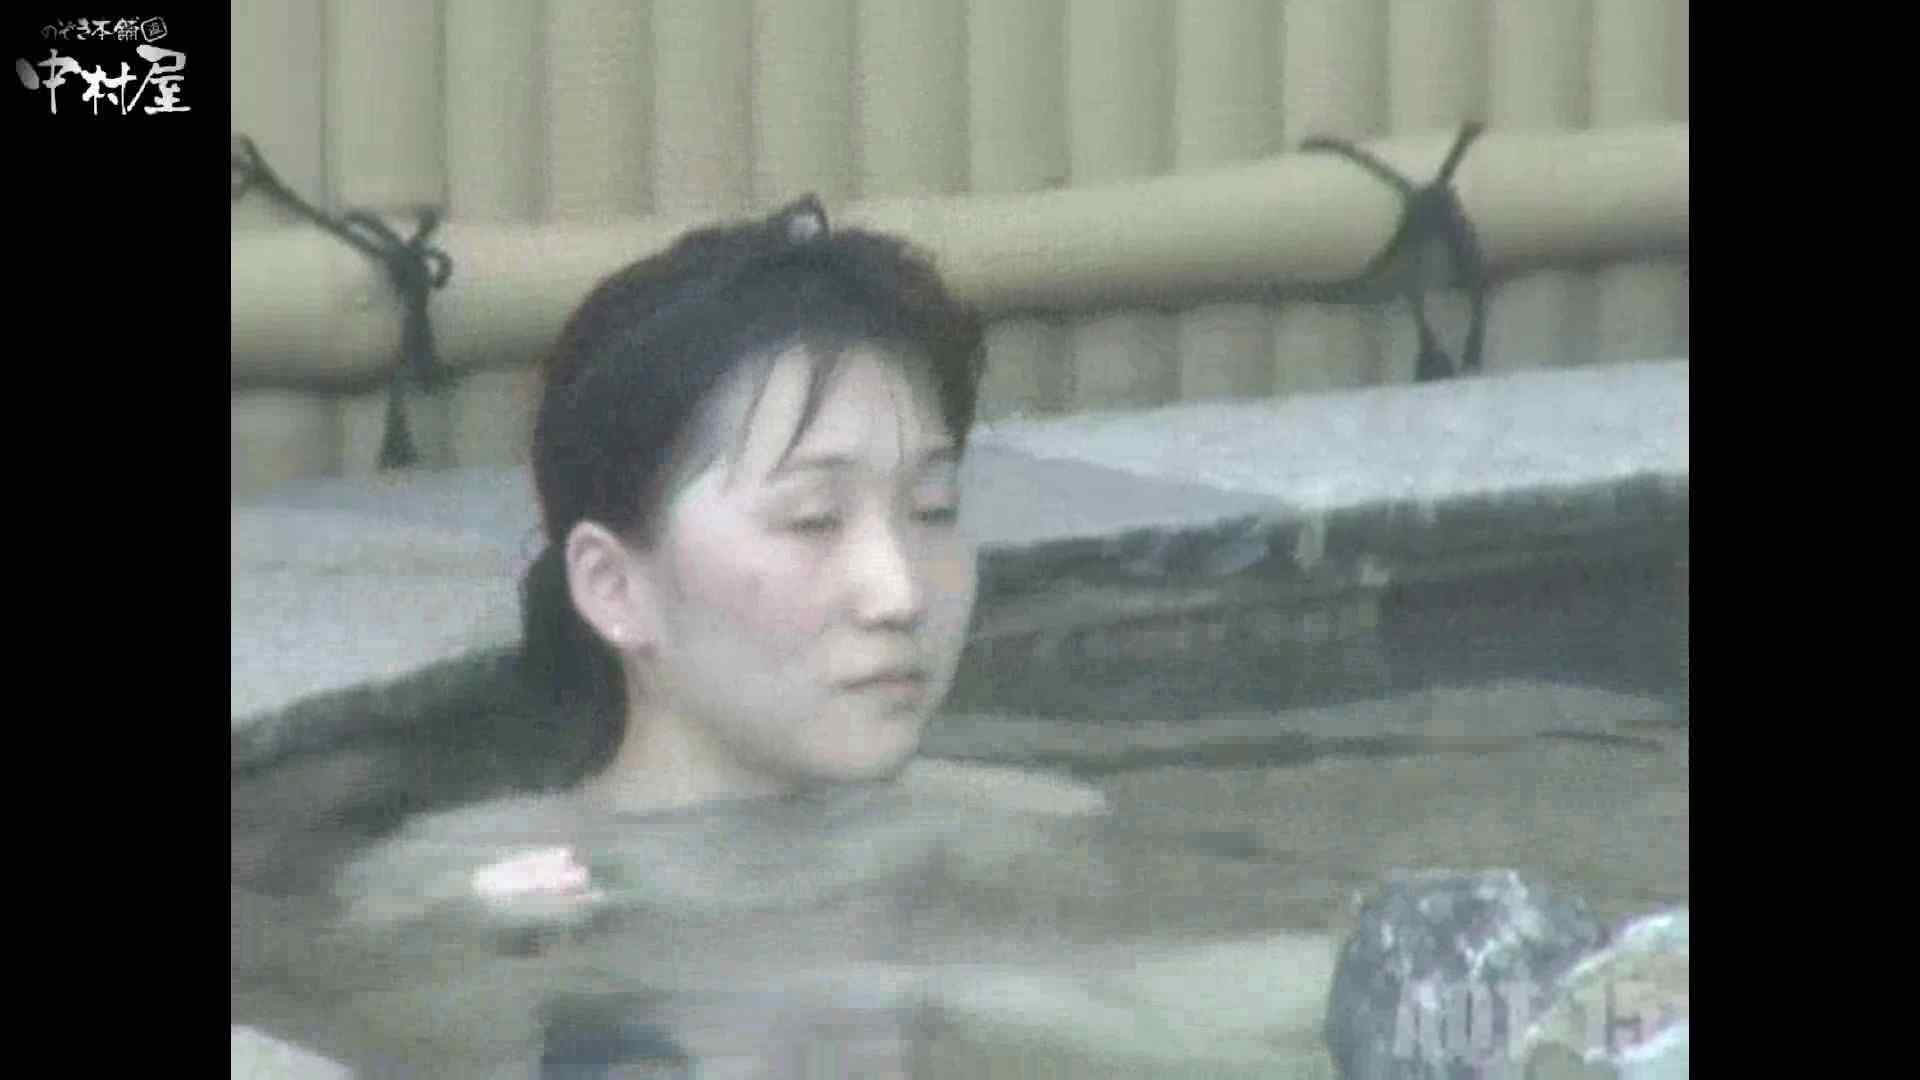 Aquaな露天風呂Vol.878潜入盗撮露天風呂十五判湯 其の一 潜入  56連発 45